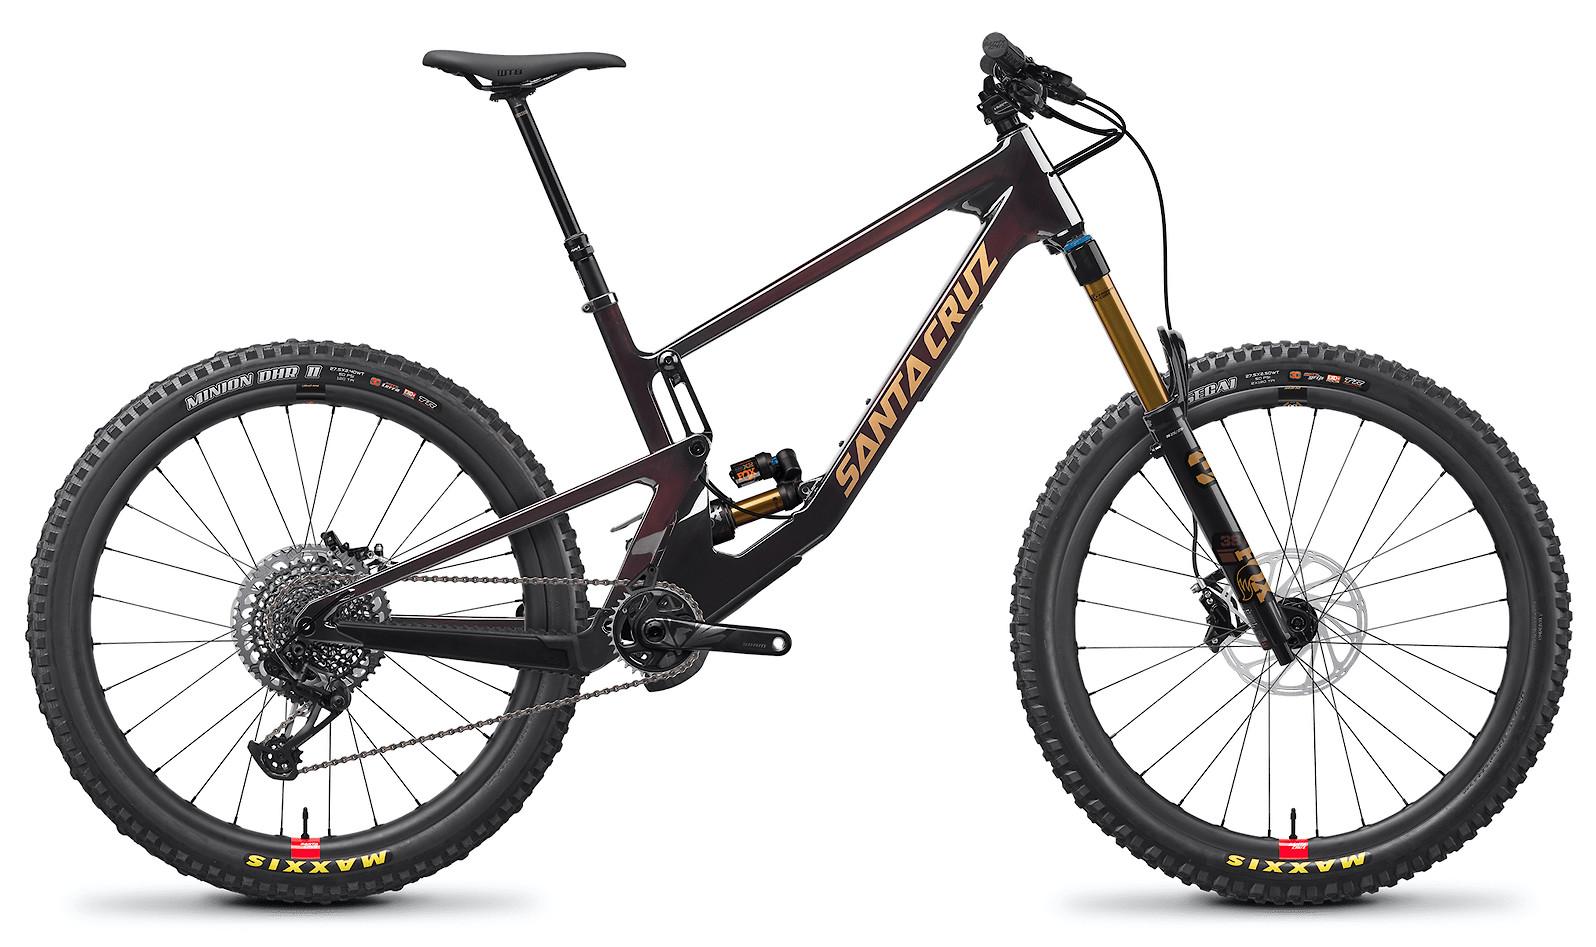 2021 Santa Cruz Nomad X01 Carbon CC Reserve (Oxblood and Tan)